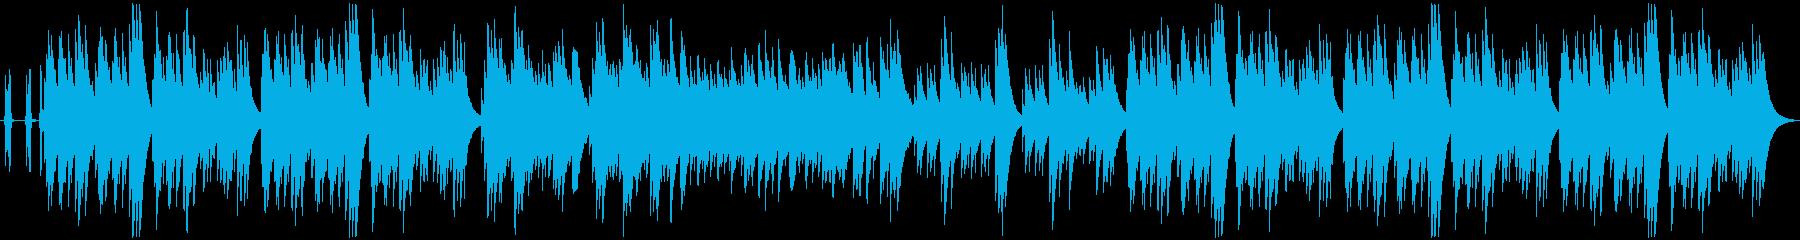 Cutetoys オルゴールVerの再生済みの波形